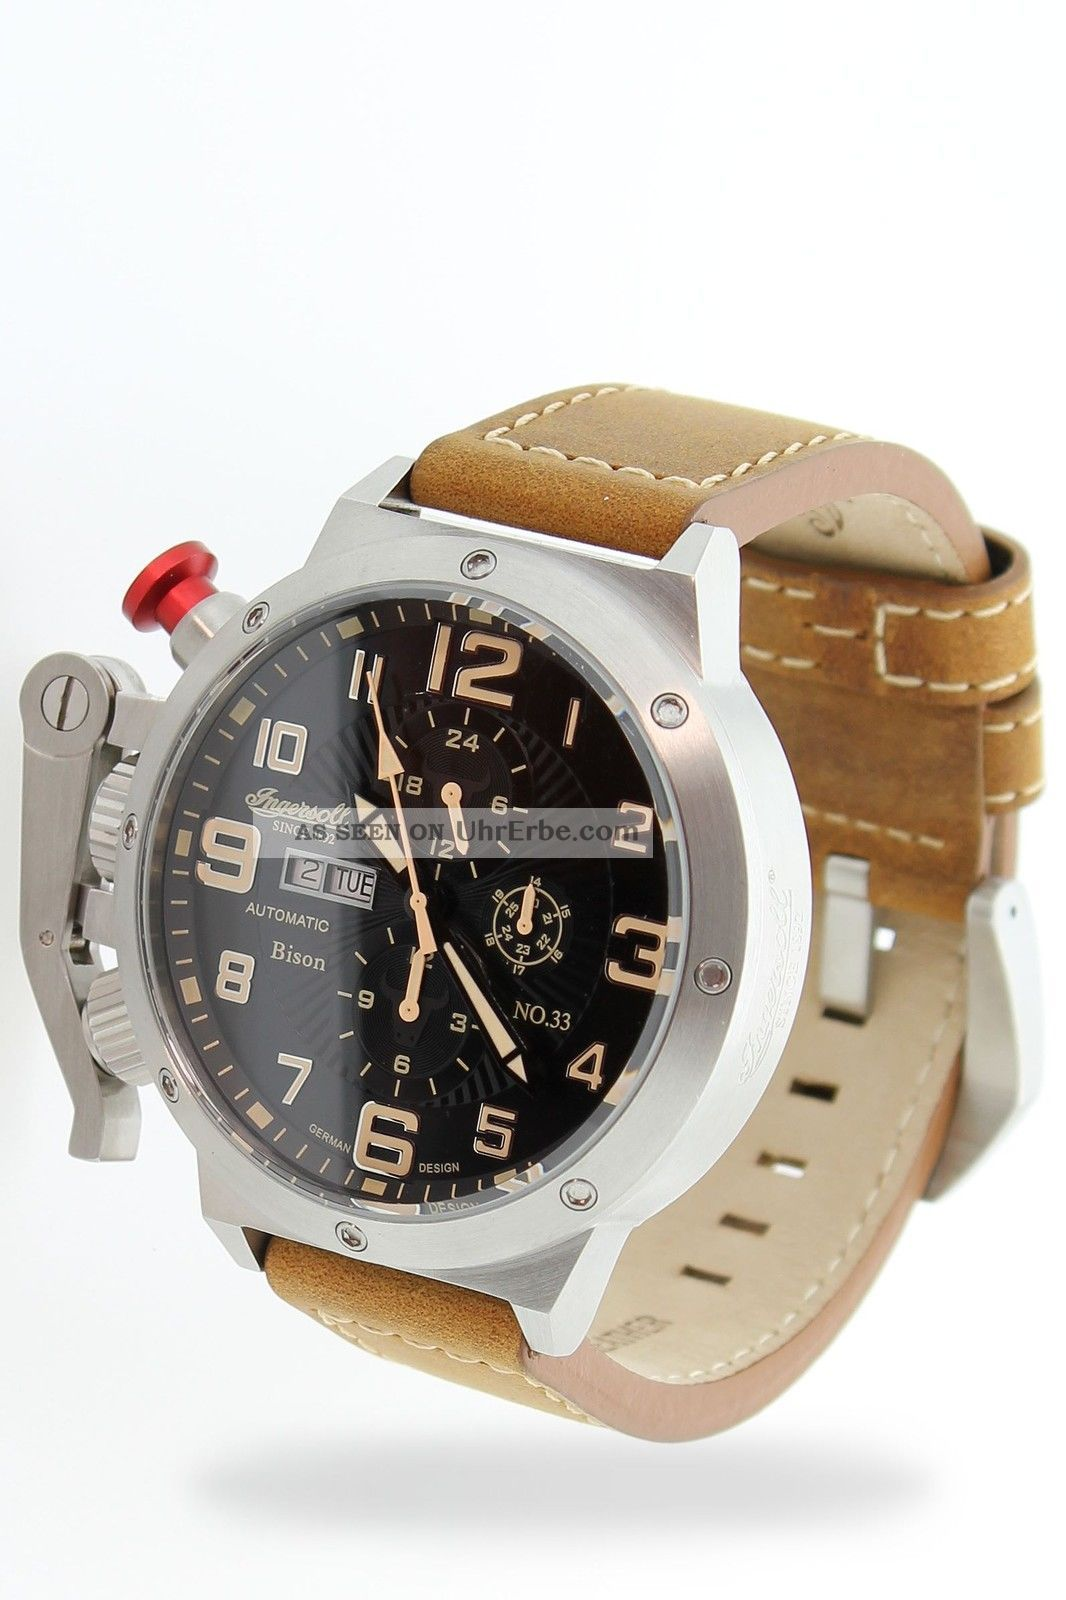 Ingersoll - Bison N0.  33 - In1629bkyl Herrenarmbanduhr Armbanduhren Bild